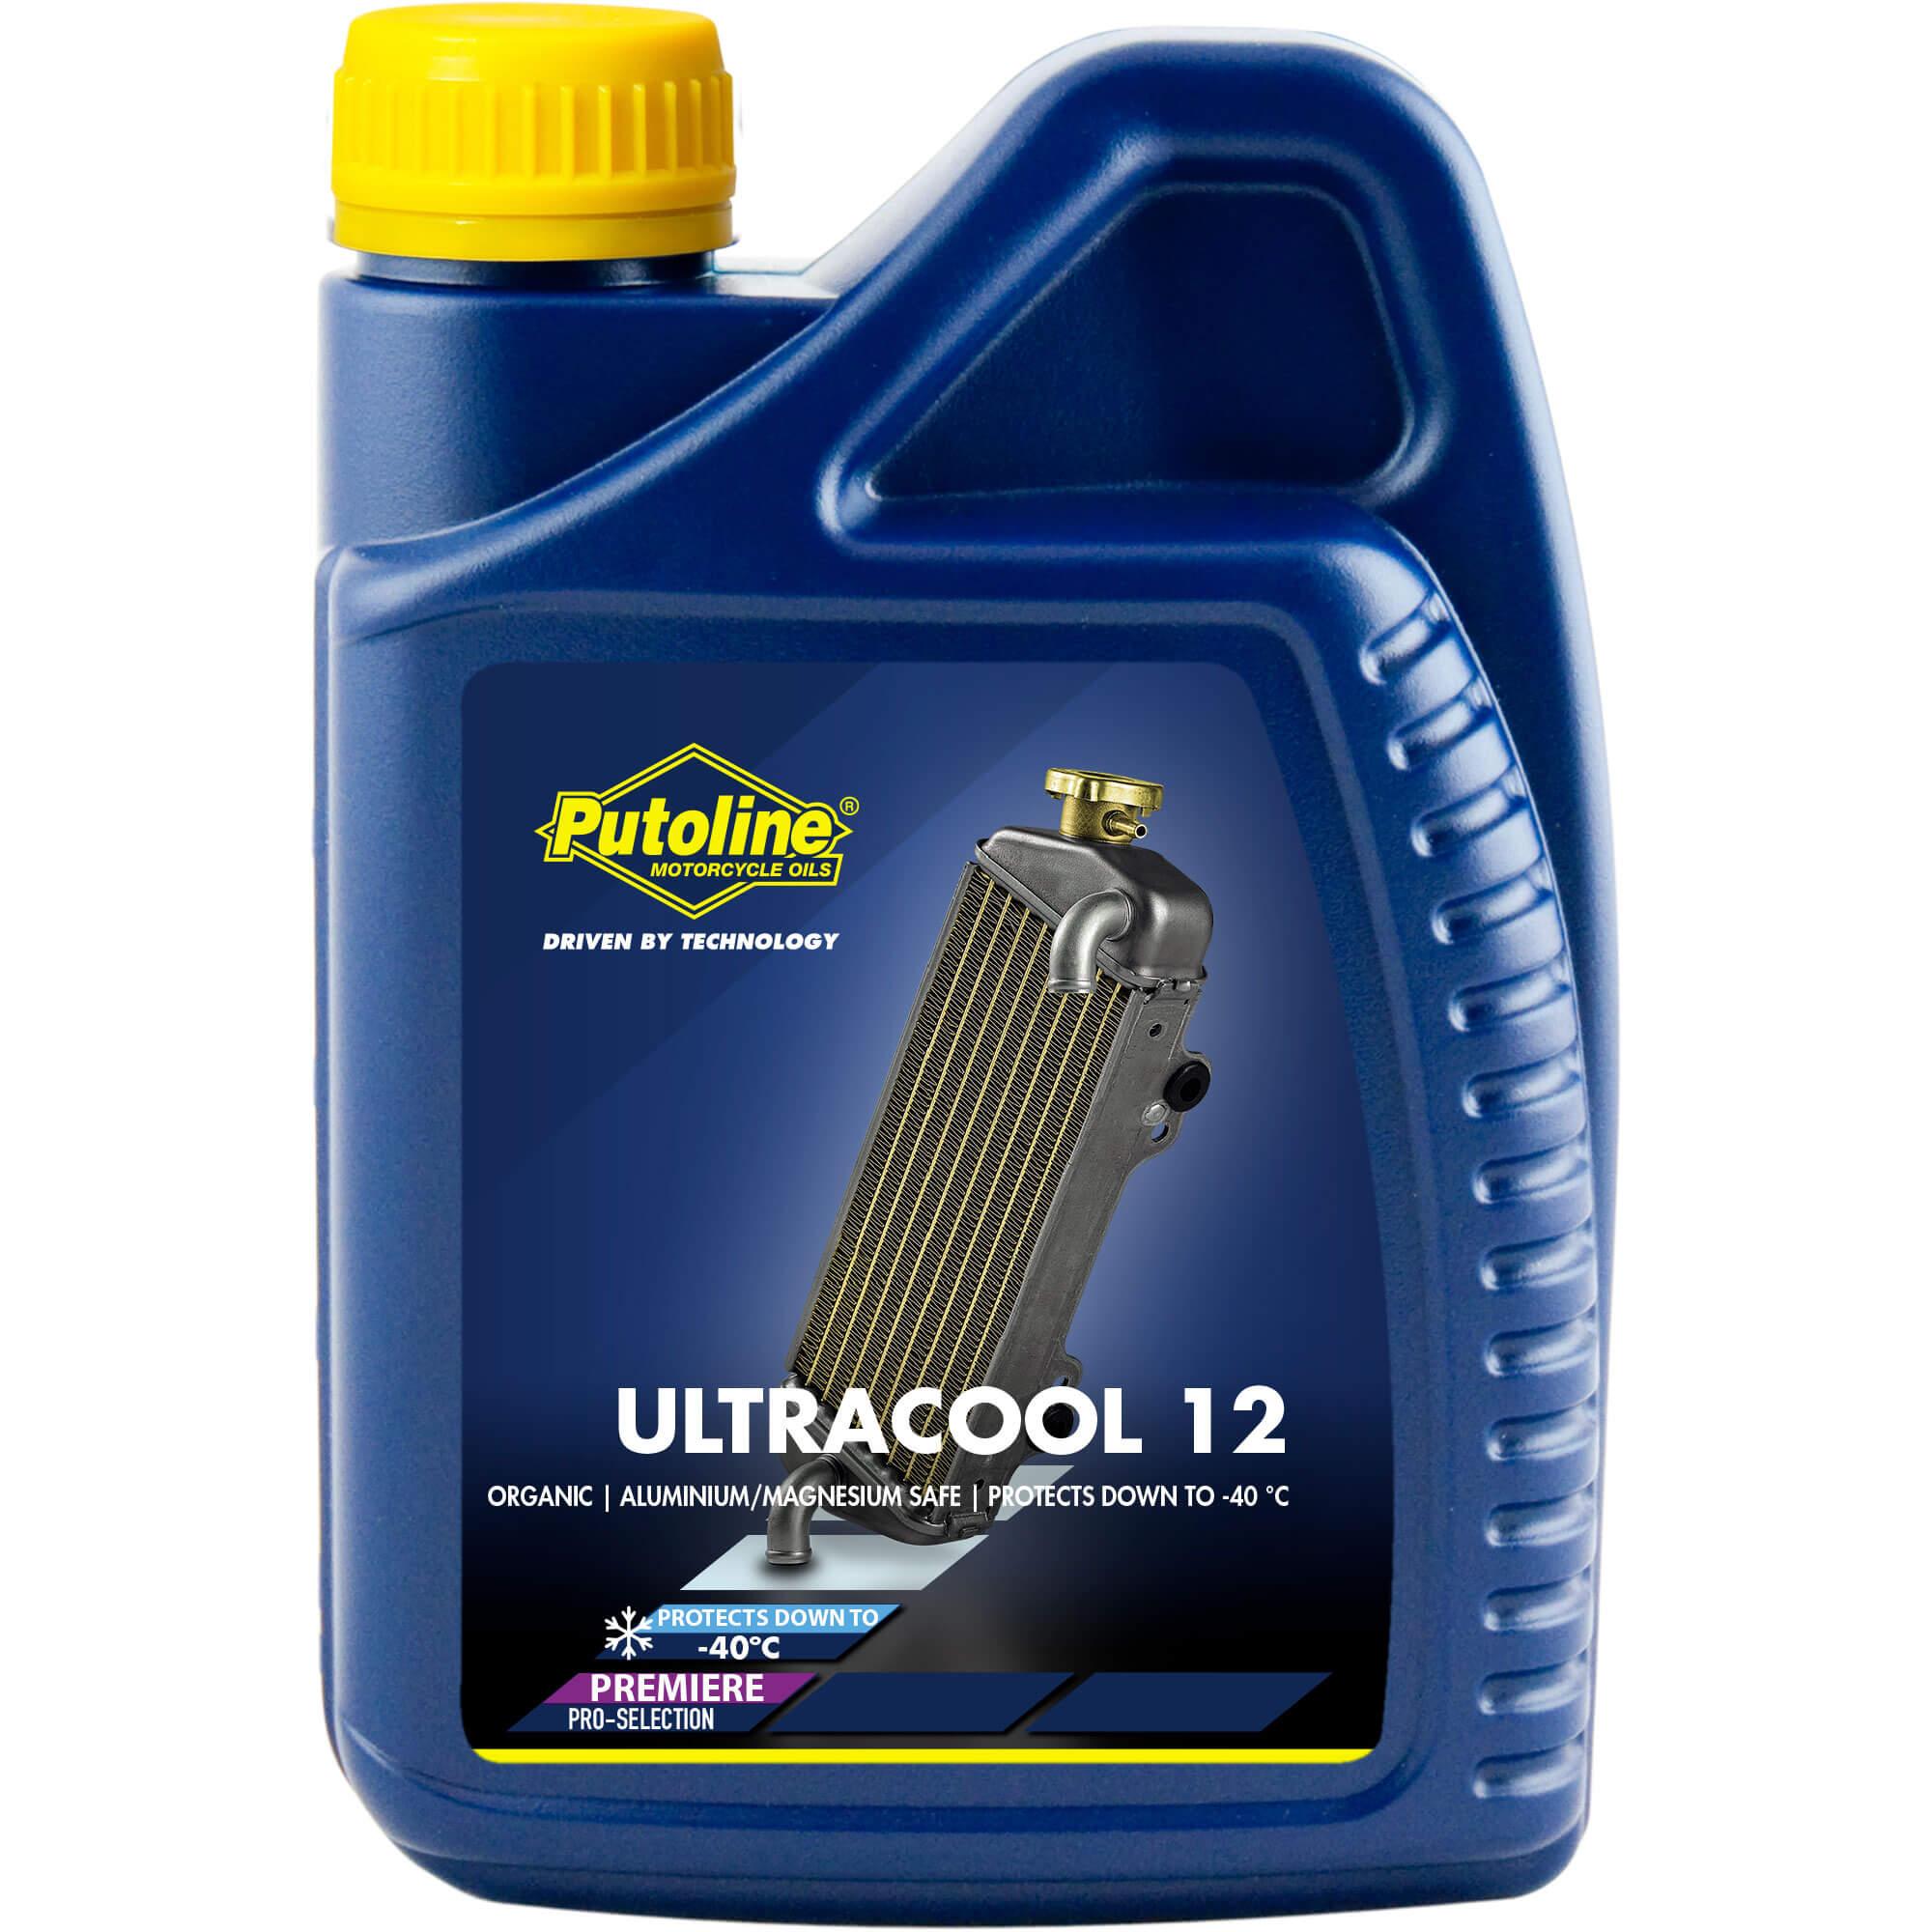 1L Liquide de refroidissement Putoline Ultracool 12